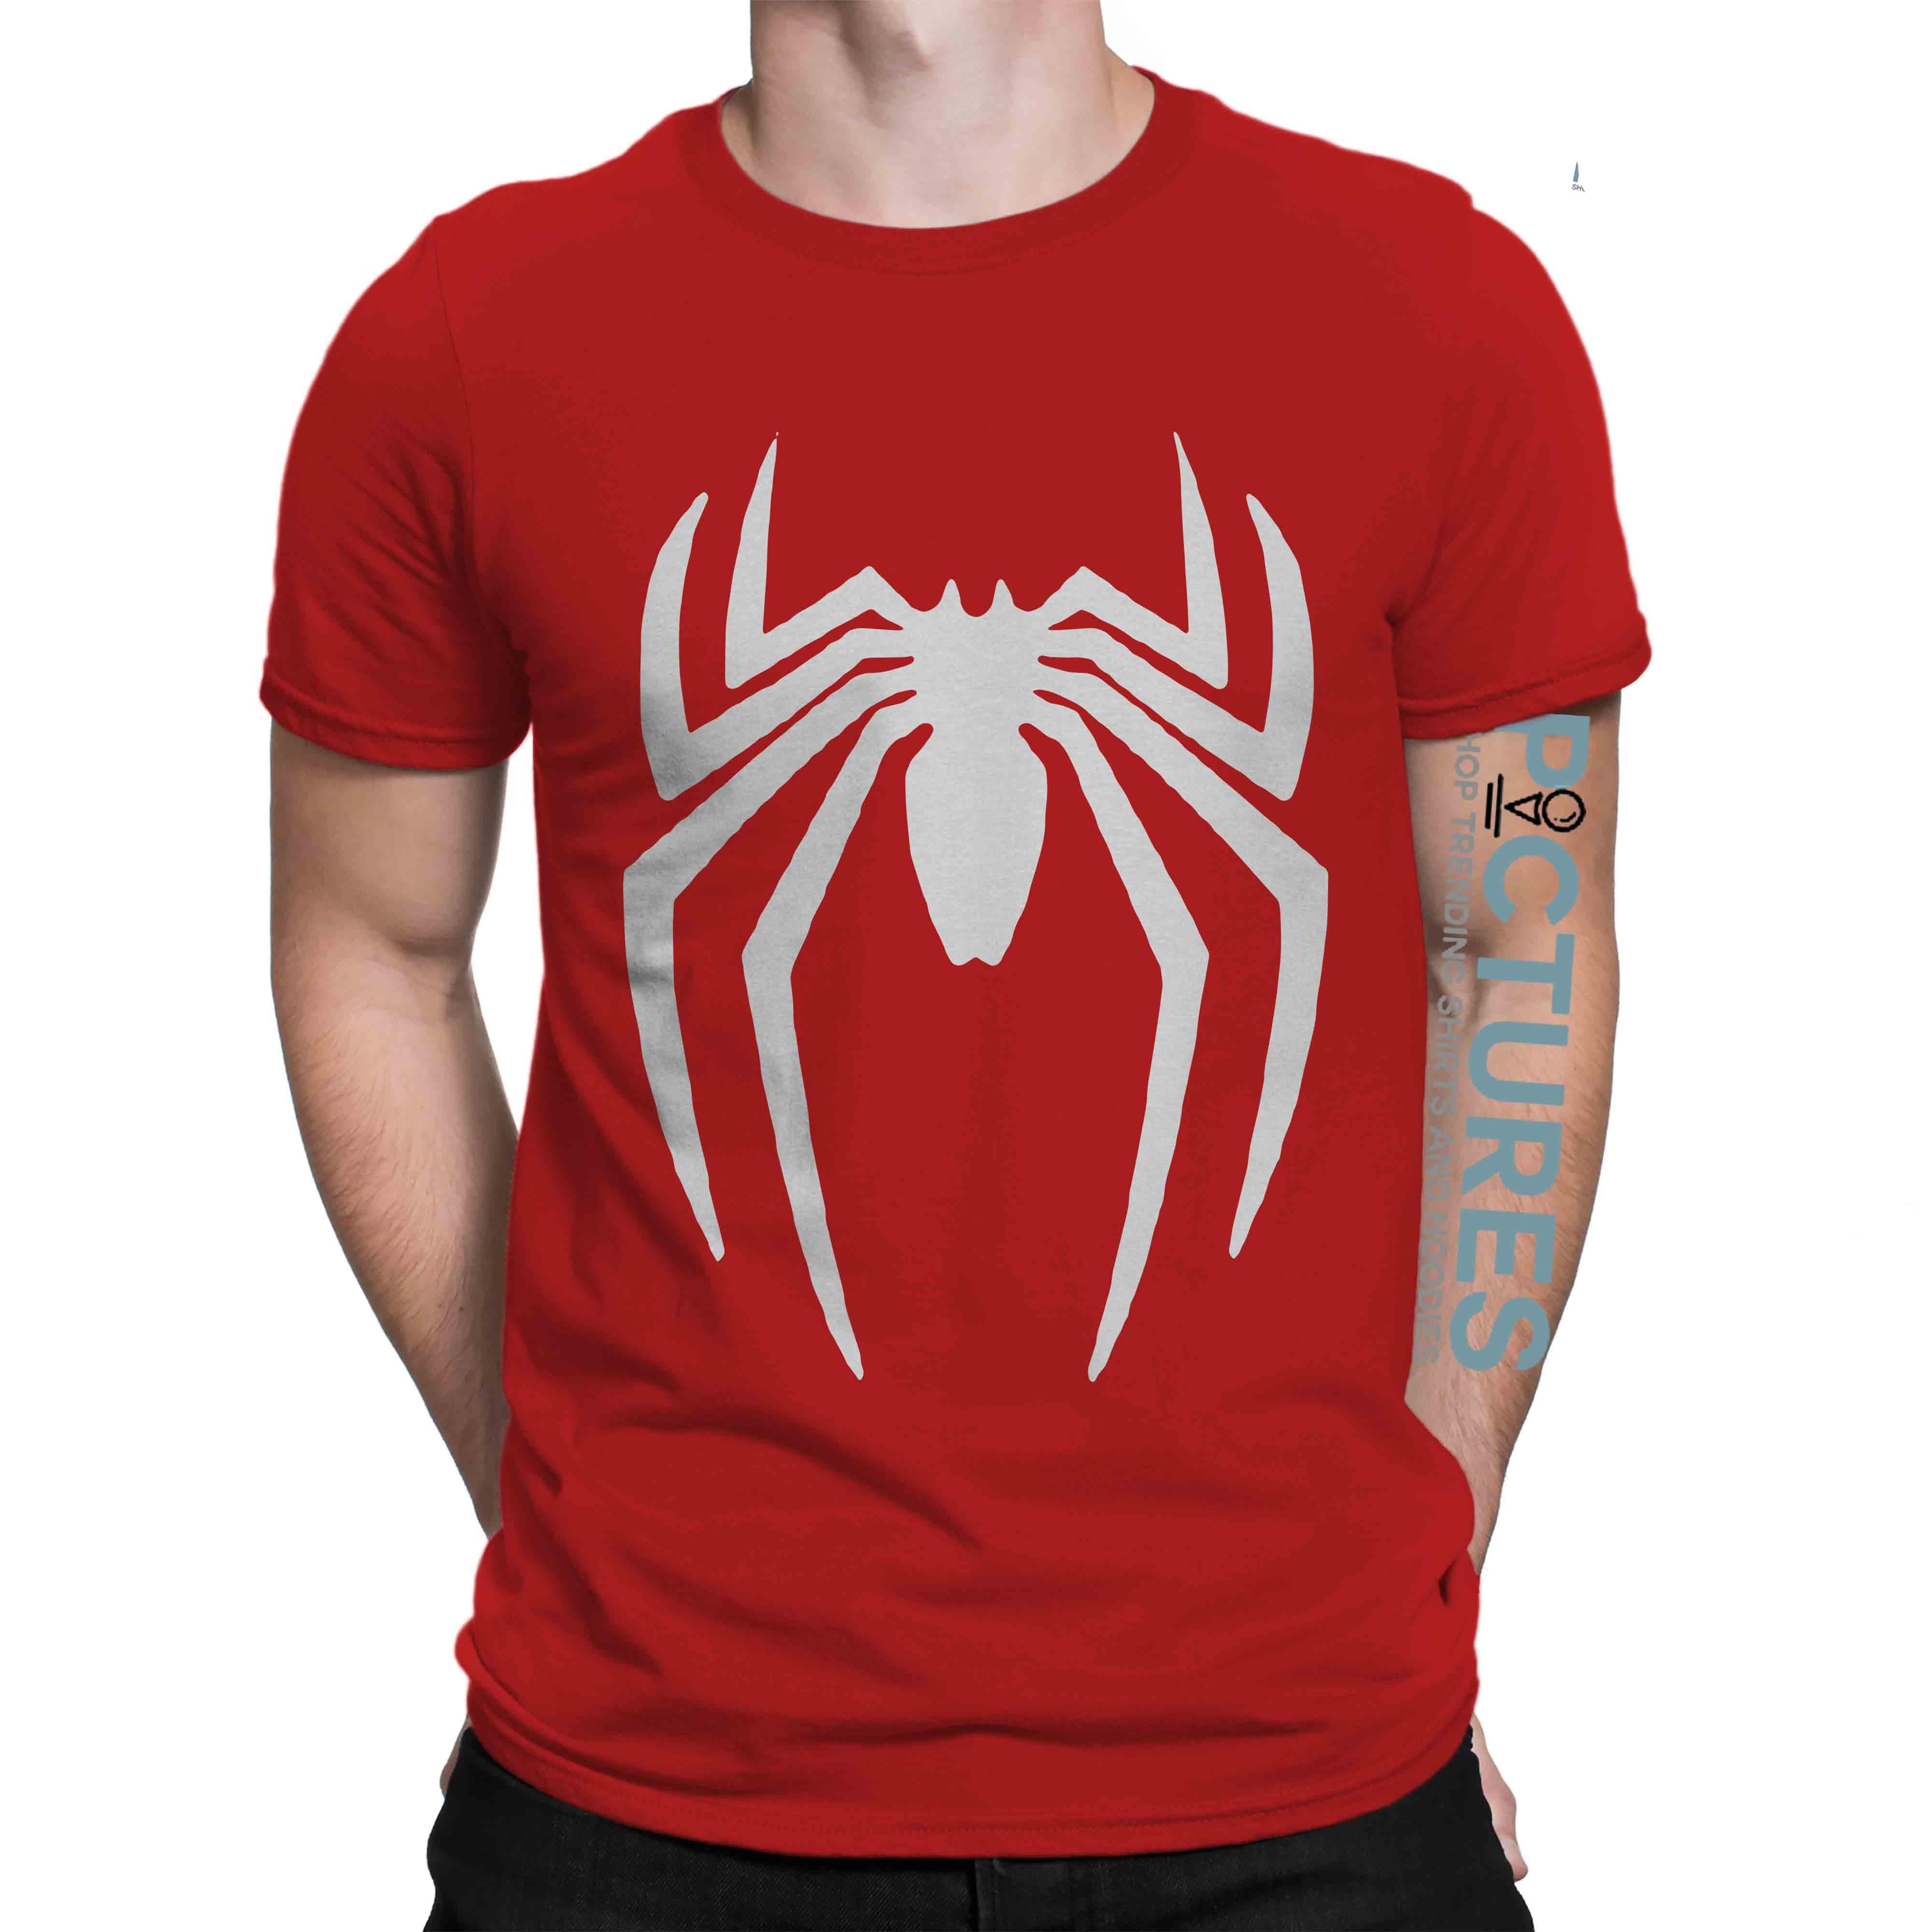 Marvels Spiderman shirt